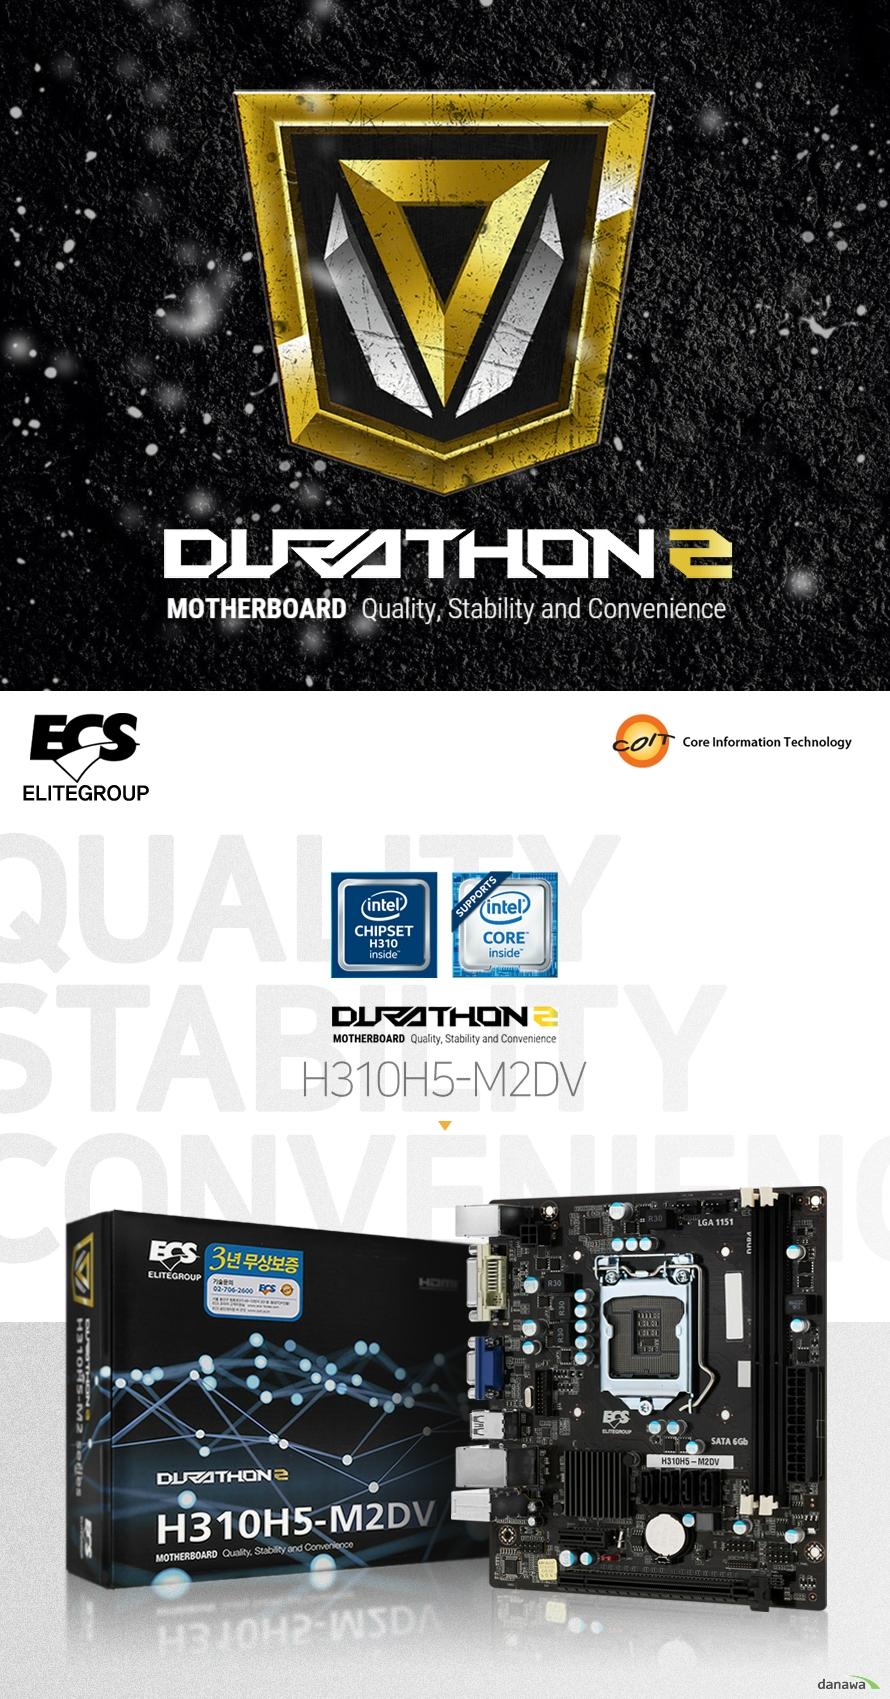 ECS DURATHON2 H310H5-M2DV 코잇